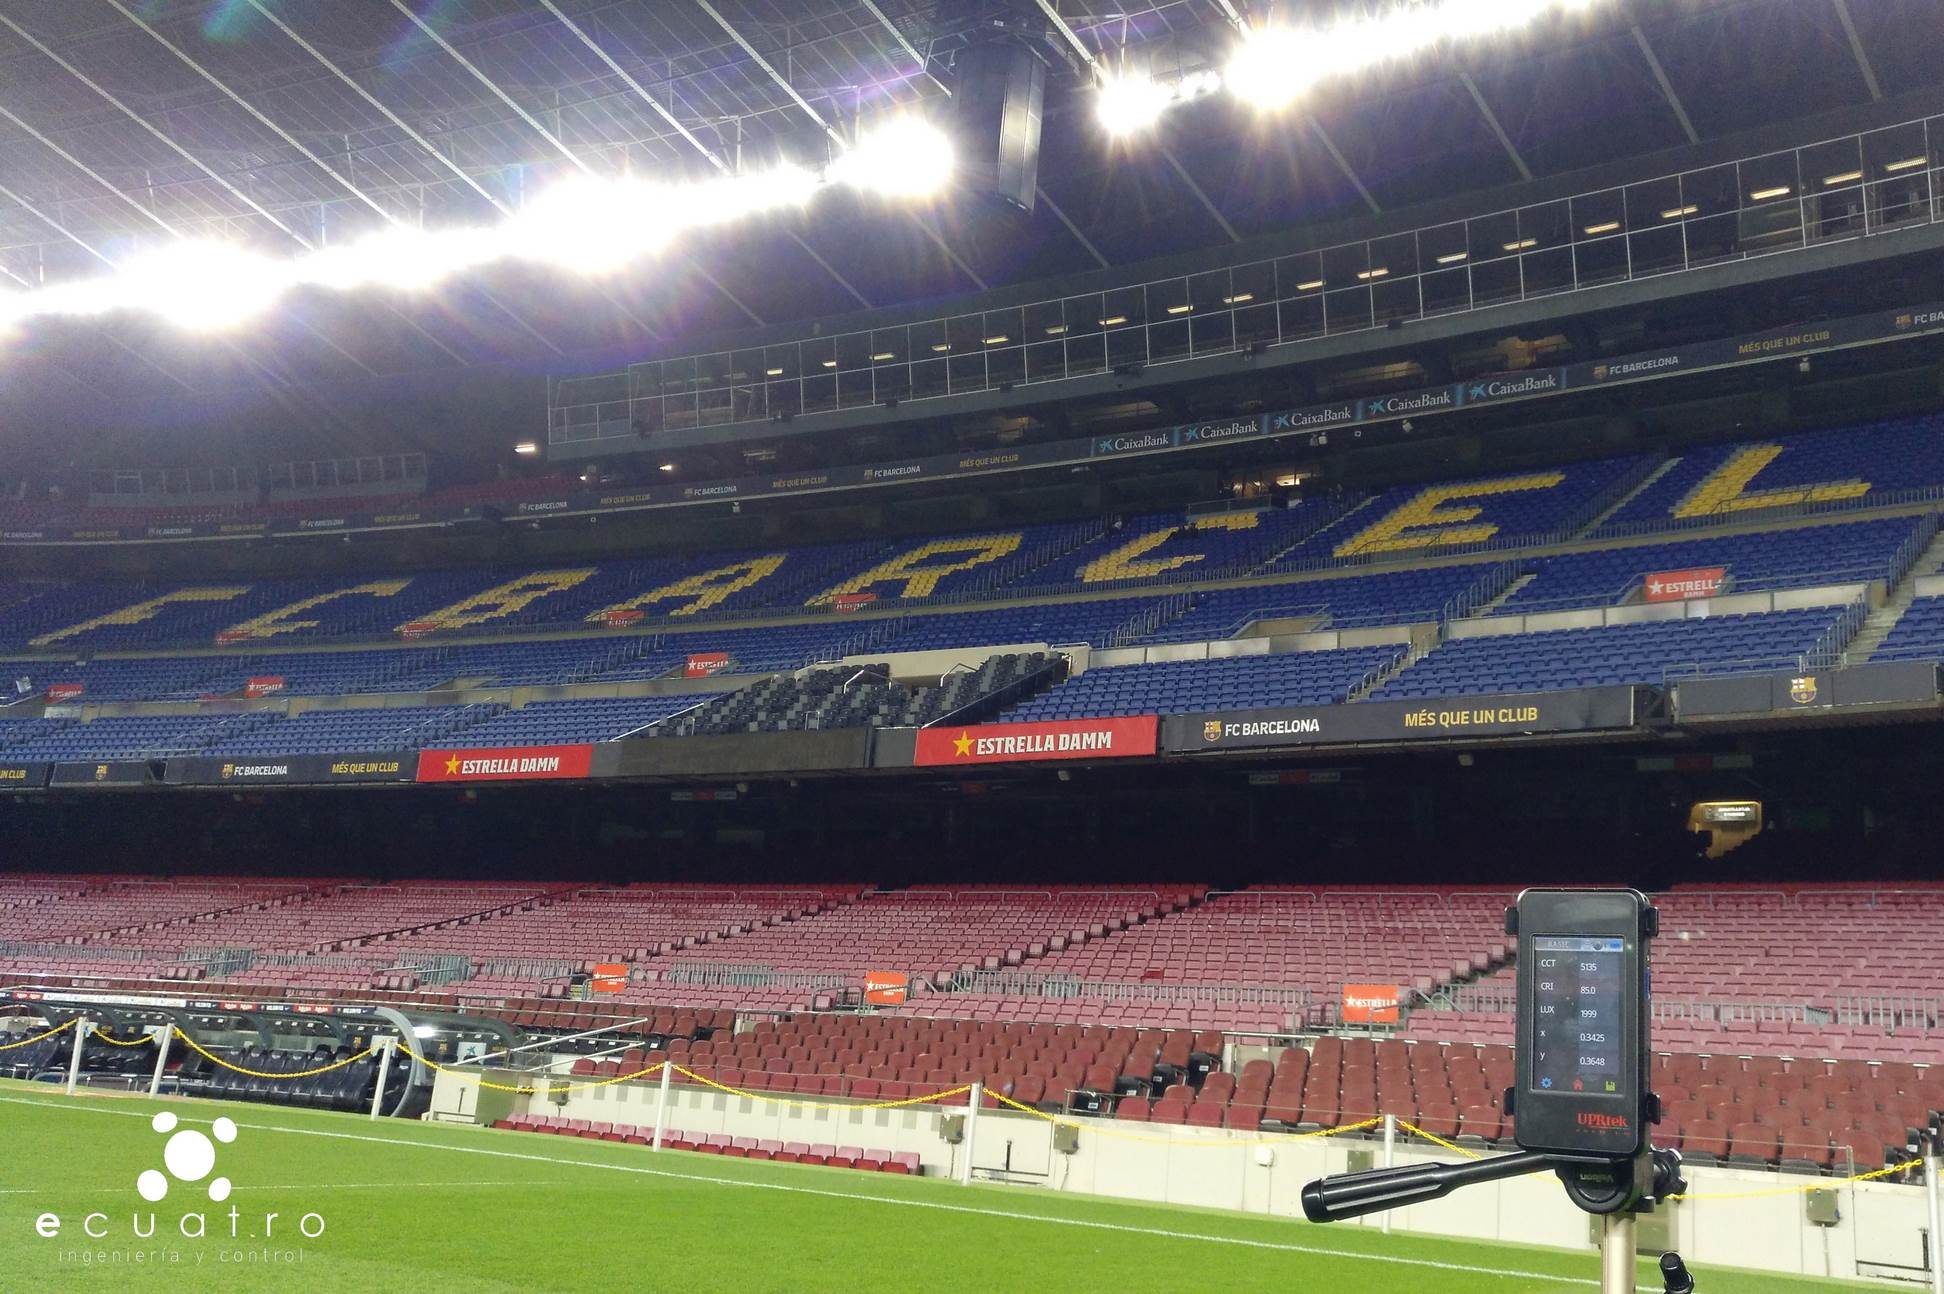 Estadio Camp Nou (FC Barcelona), Barcelona